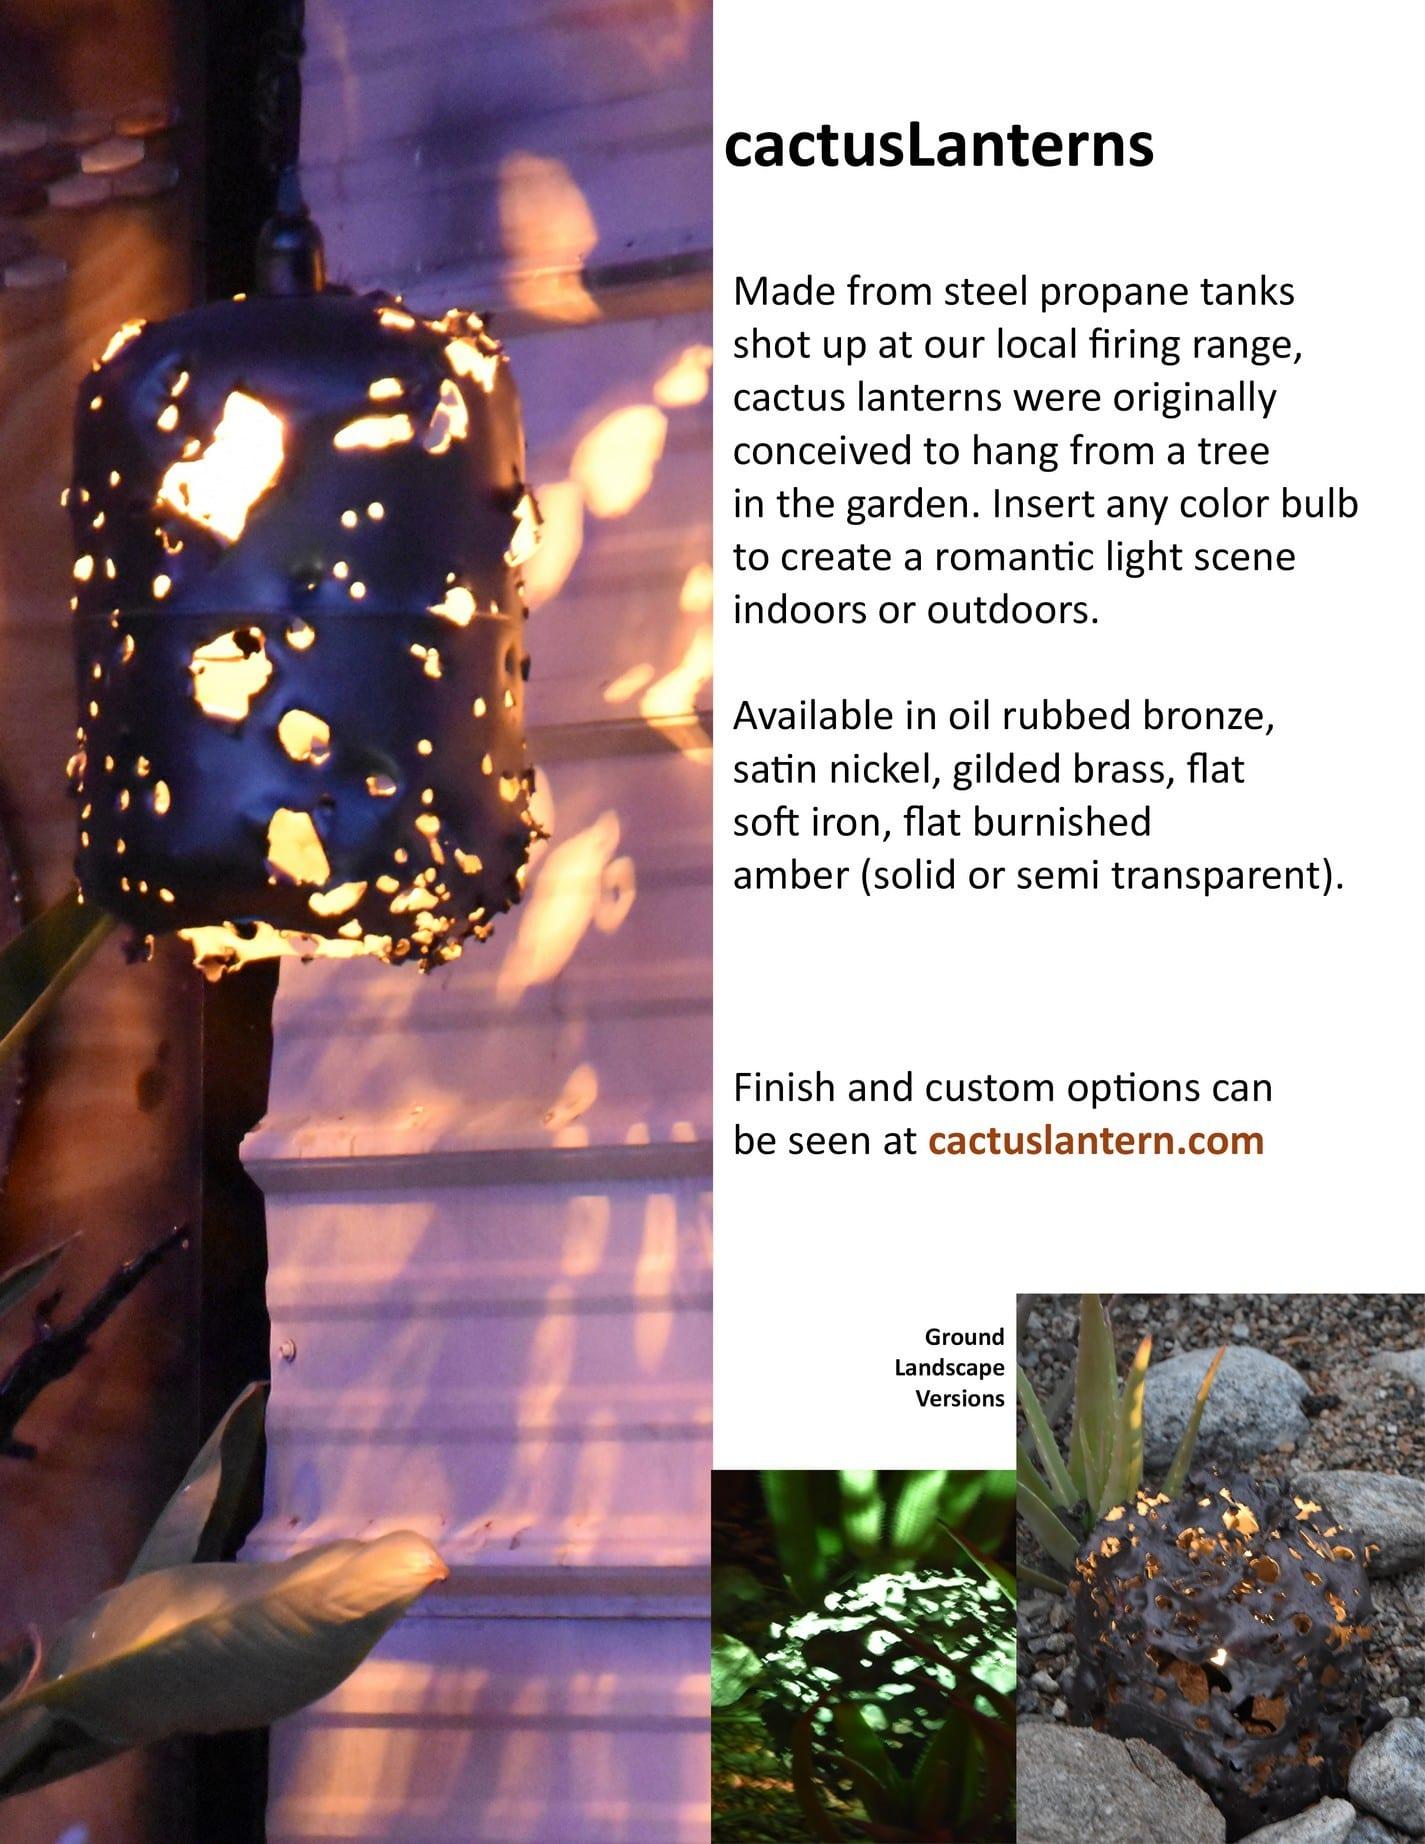 cactus lanterns pg 2